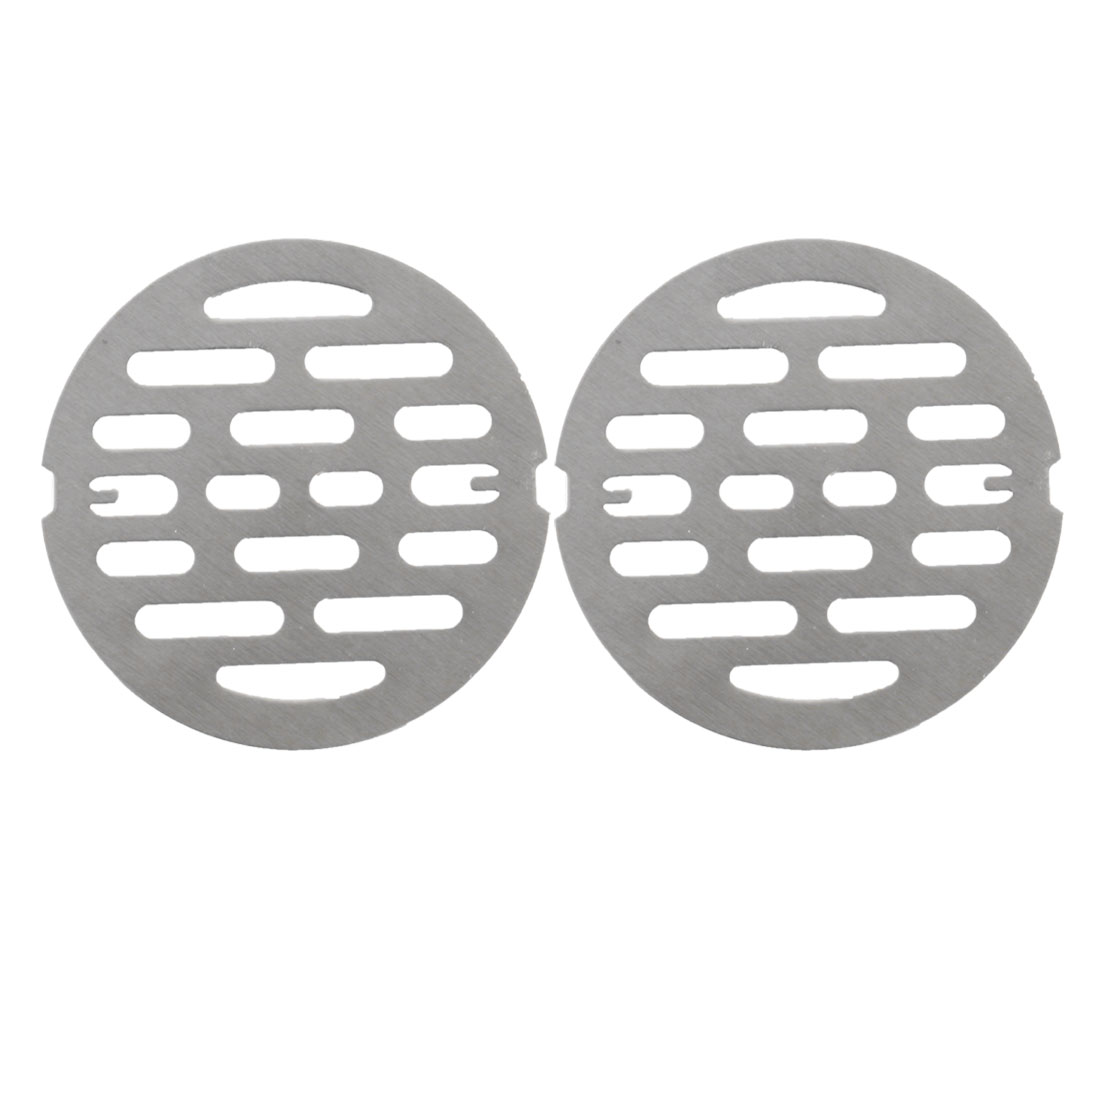 "2pcs 3.2"" Snap-in Floor Drain Cover Hair Catcher Sink Filter Strainer Stopper"